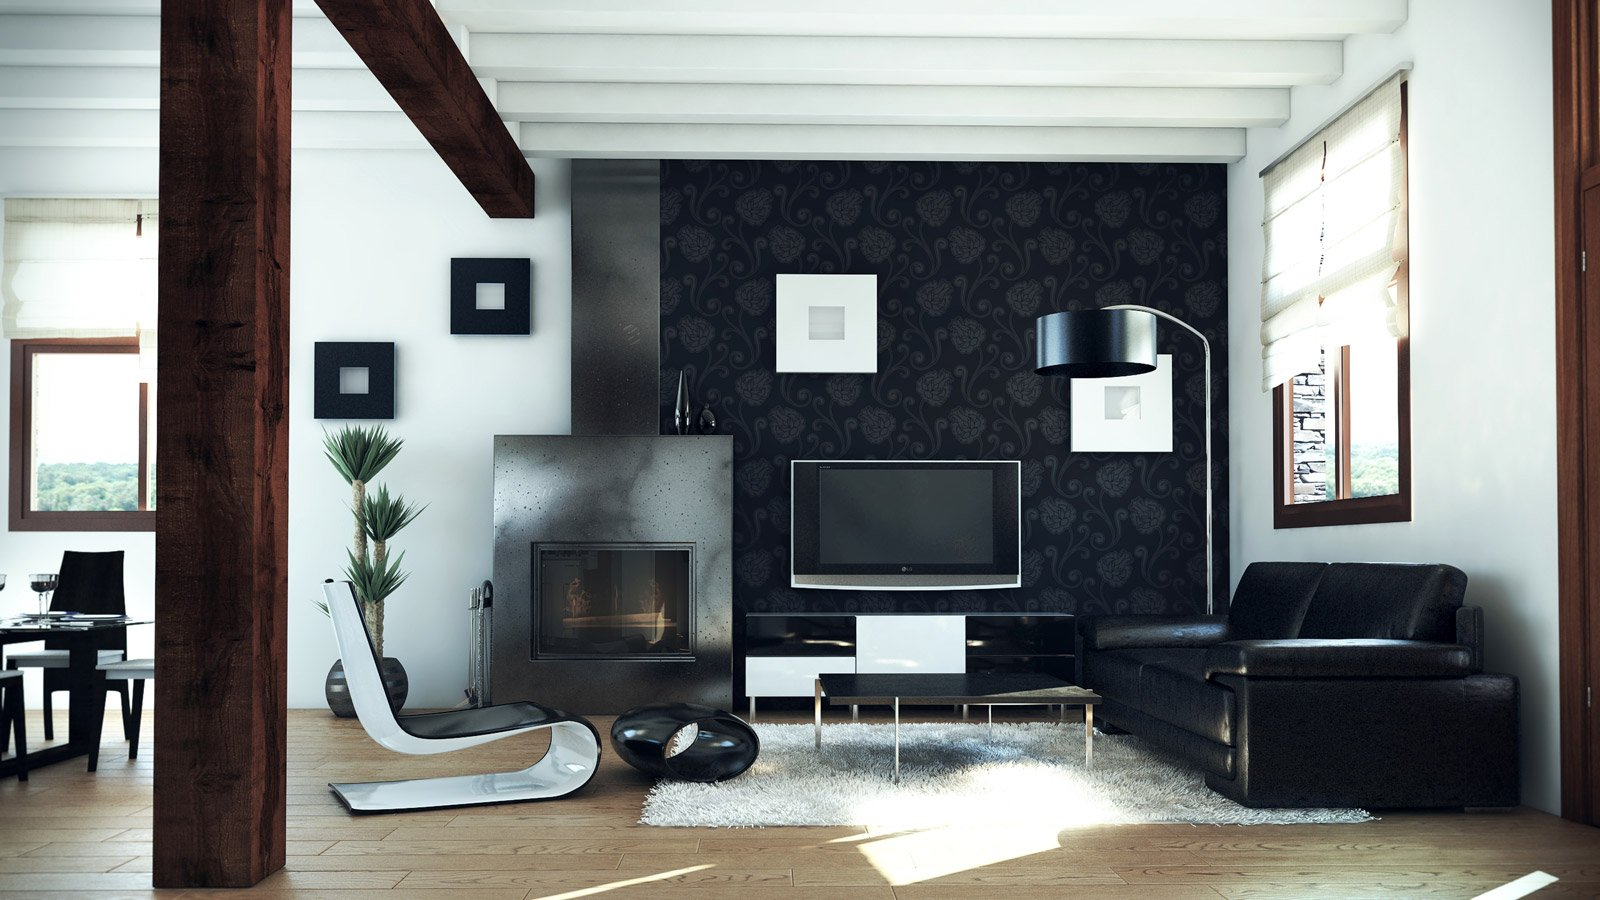 Interiorismo sal n vivienda estudio de dise o grafic3d - Interiorismo de salones ...